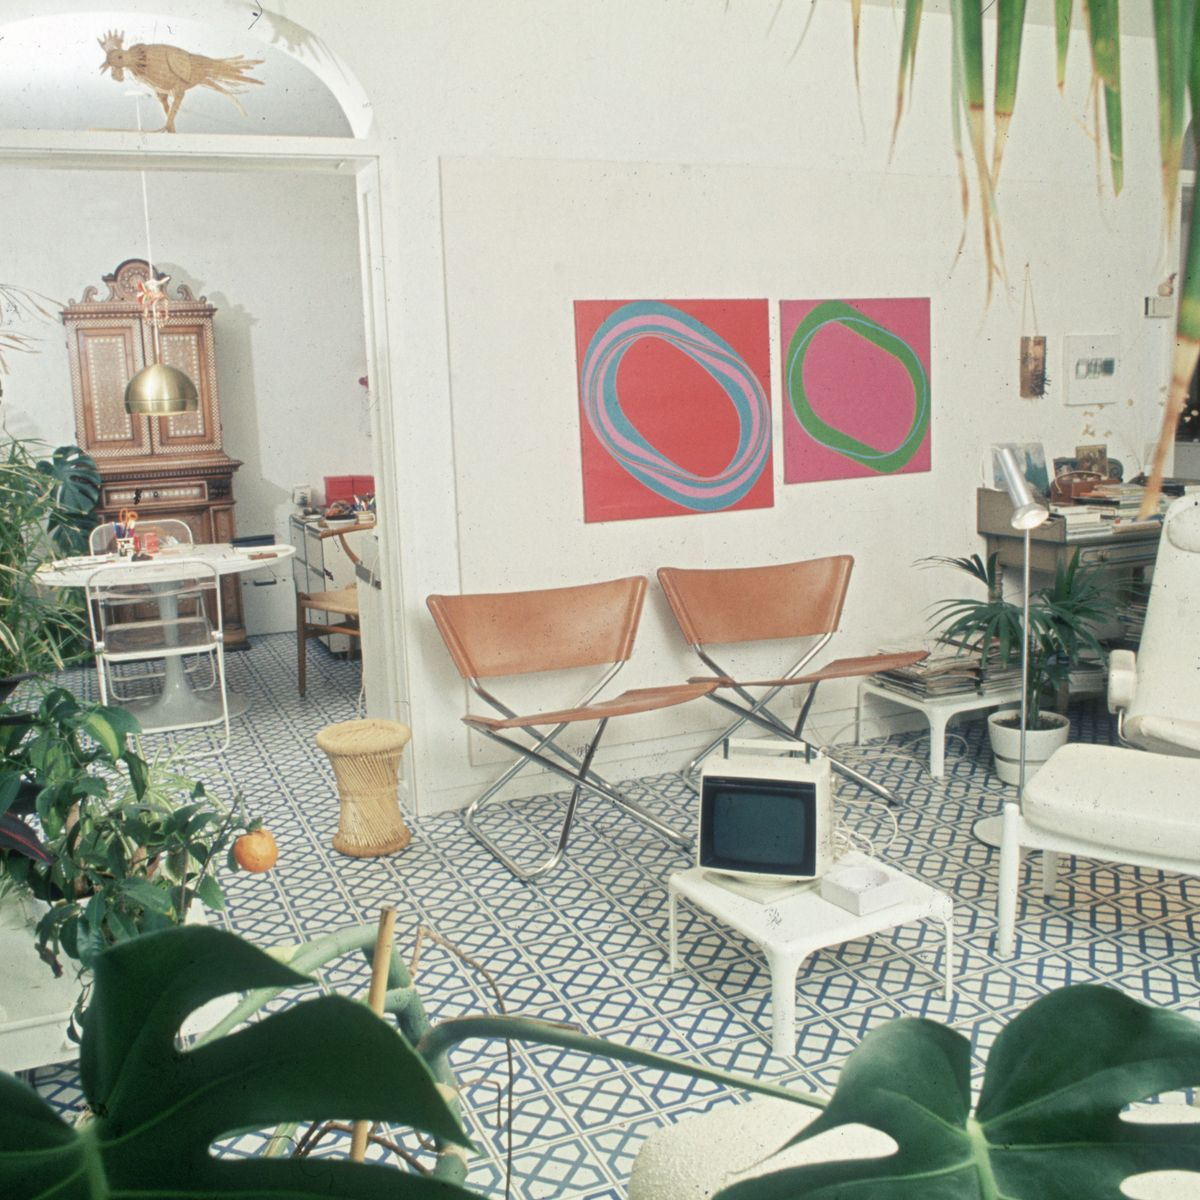 The Best Home Decor And Interior Design Ideas 2017 The Strategist New York Magazine